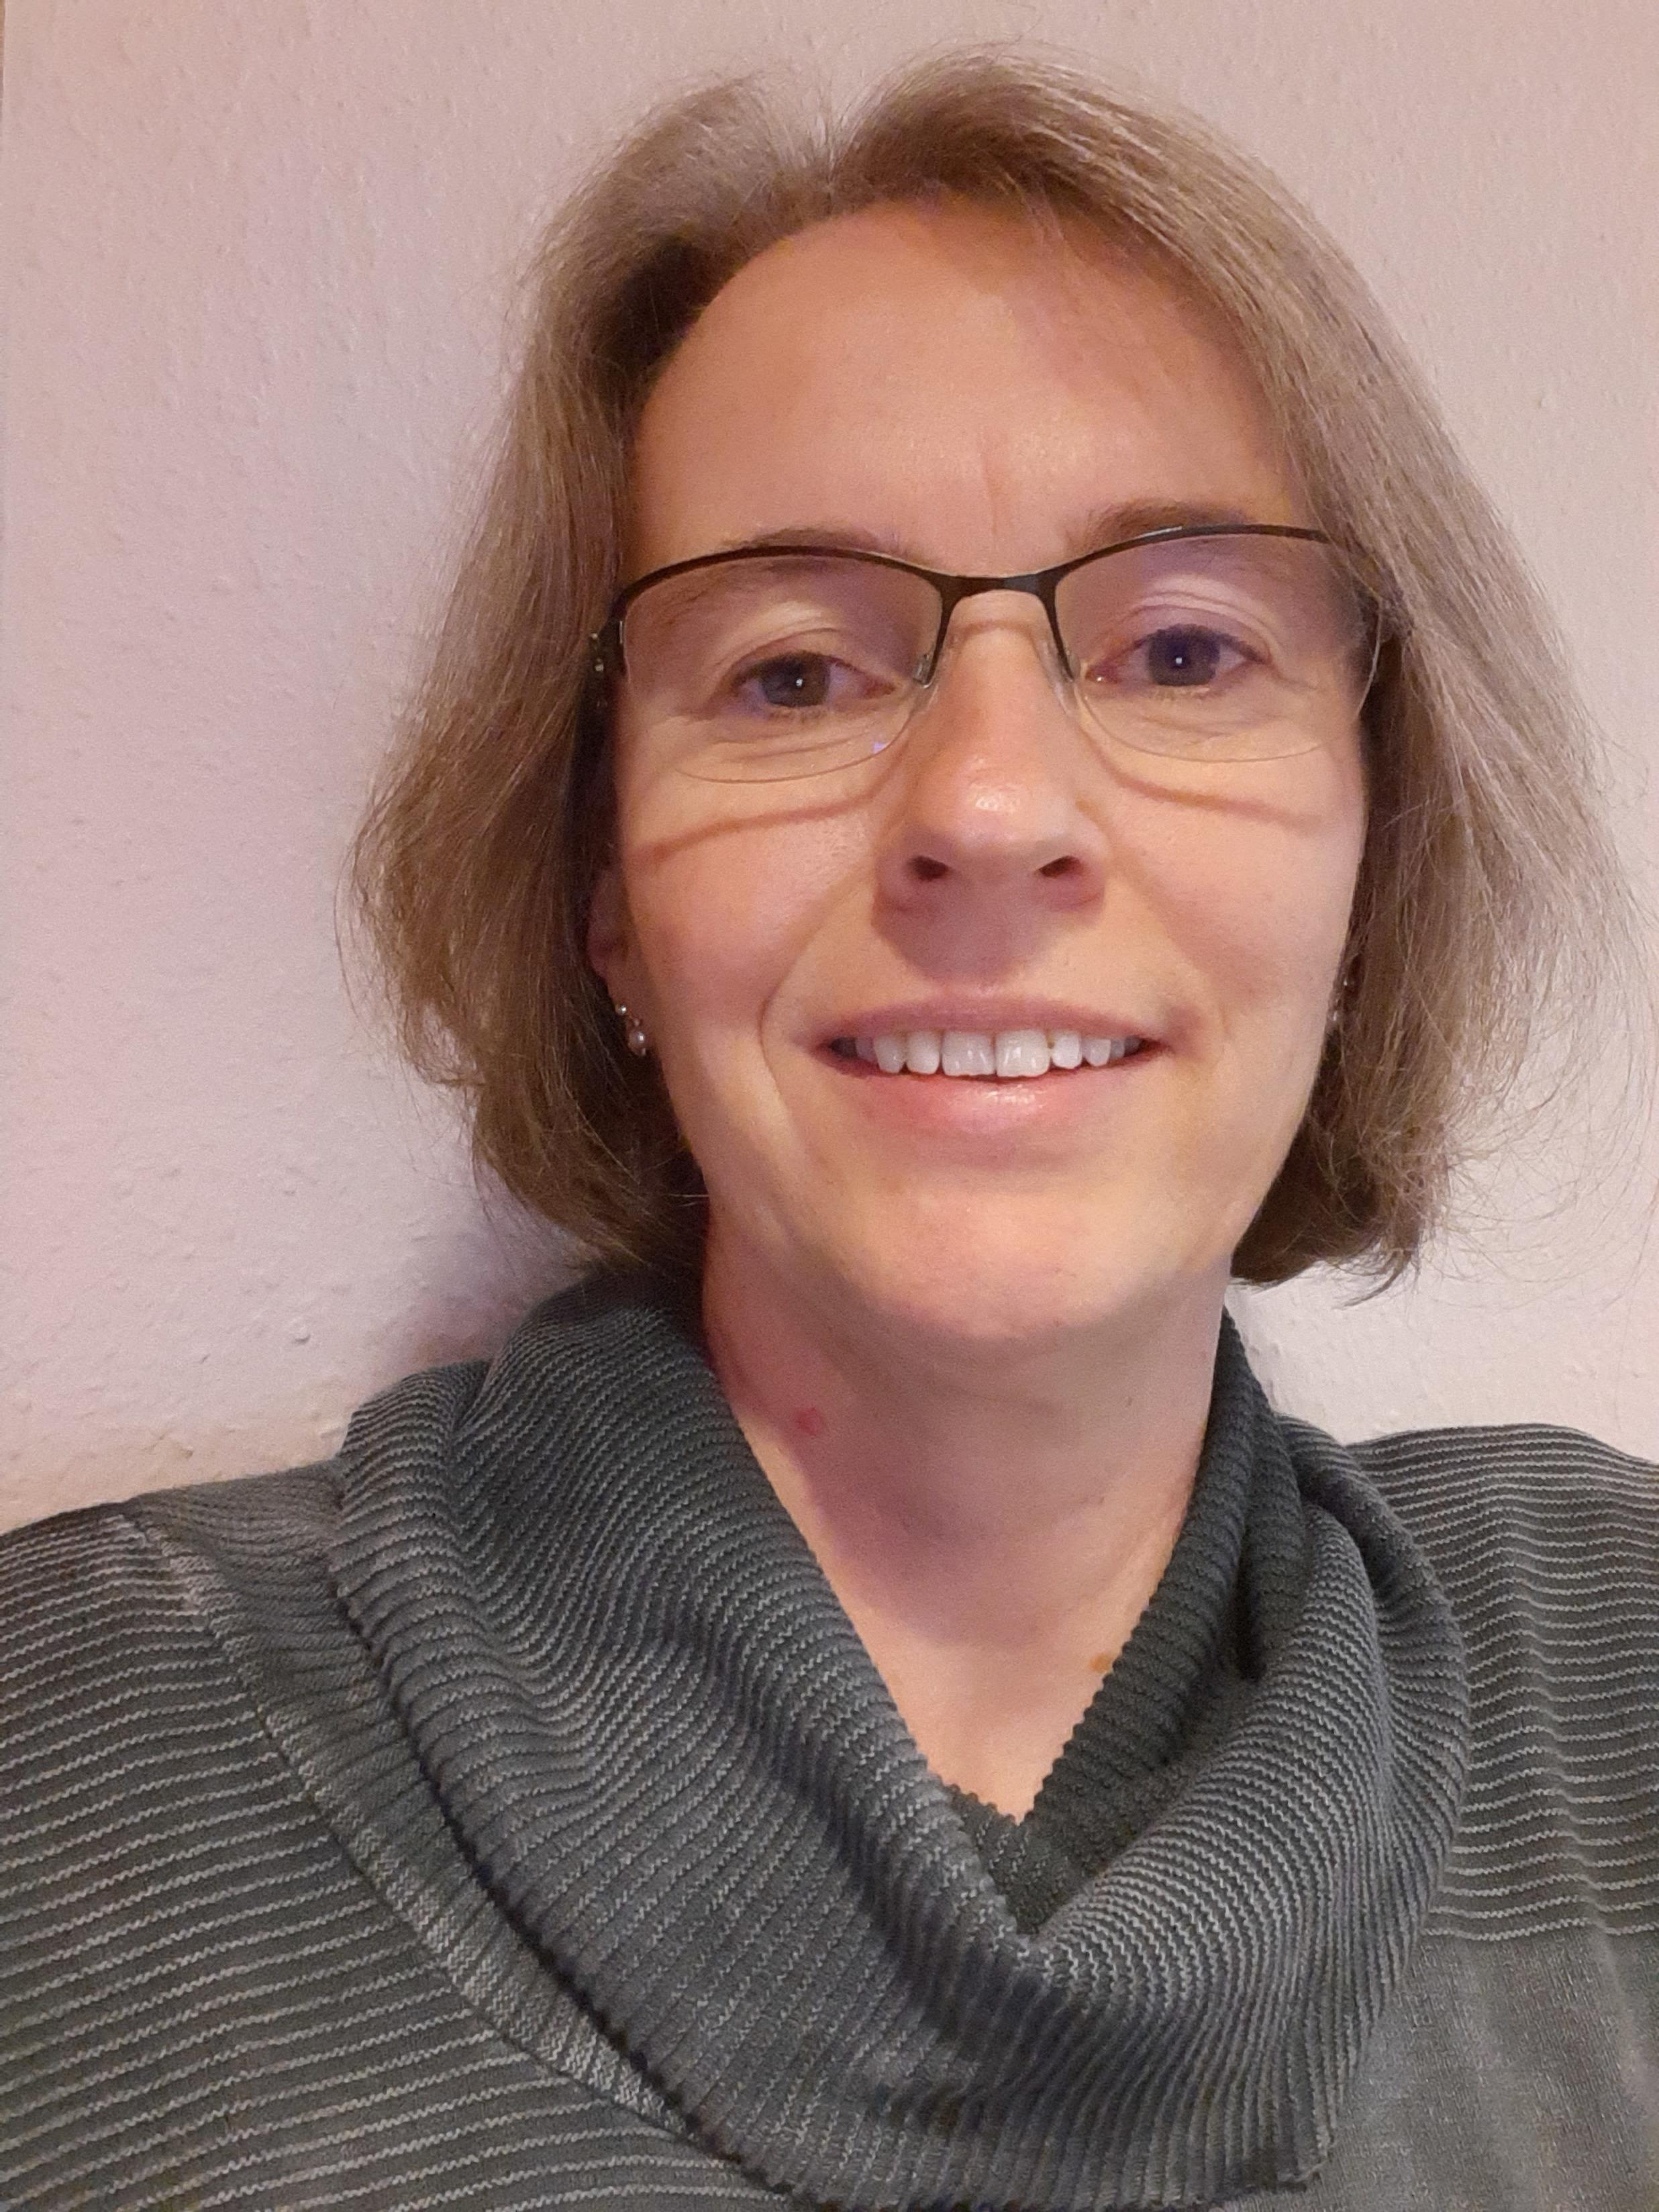 Claudia Rolke